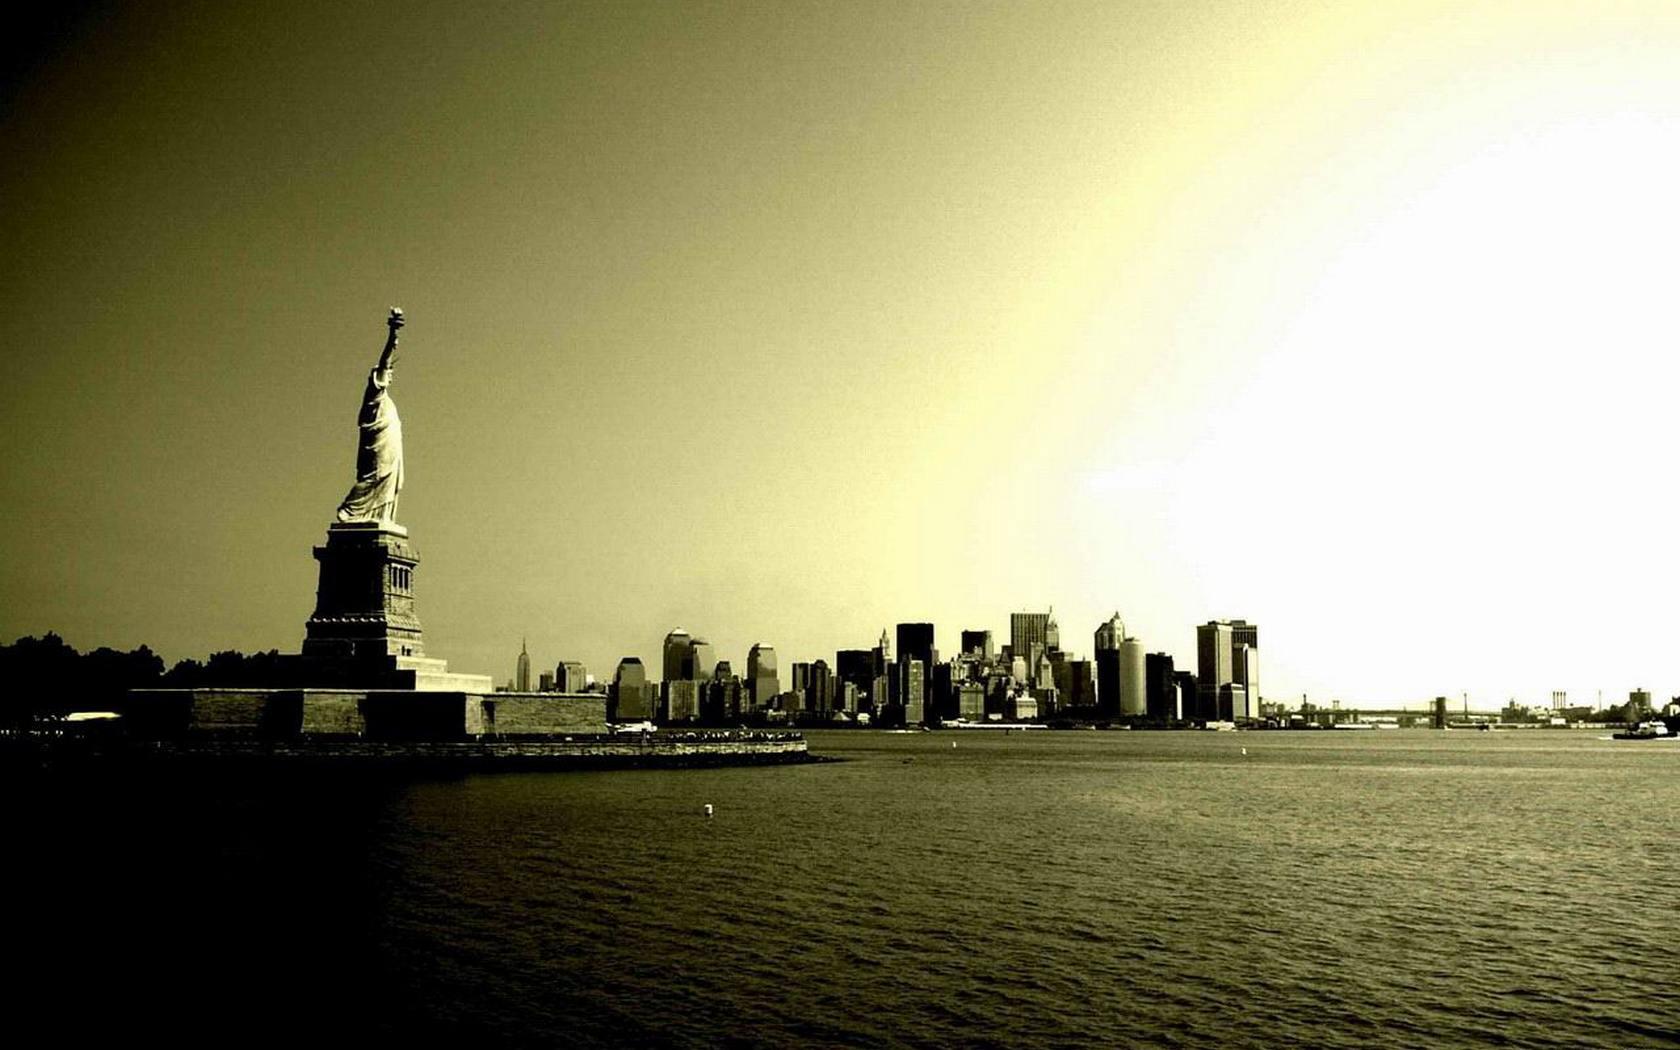 47 Statue Of Liberty Hd Wallpaper On Wallpapersafari